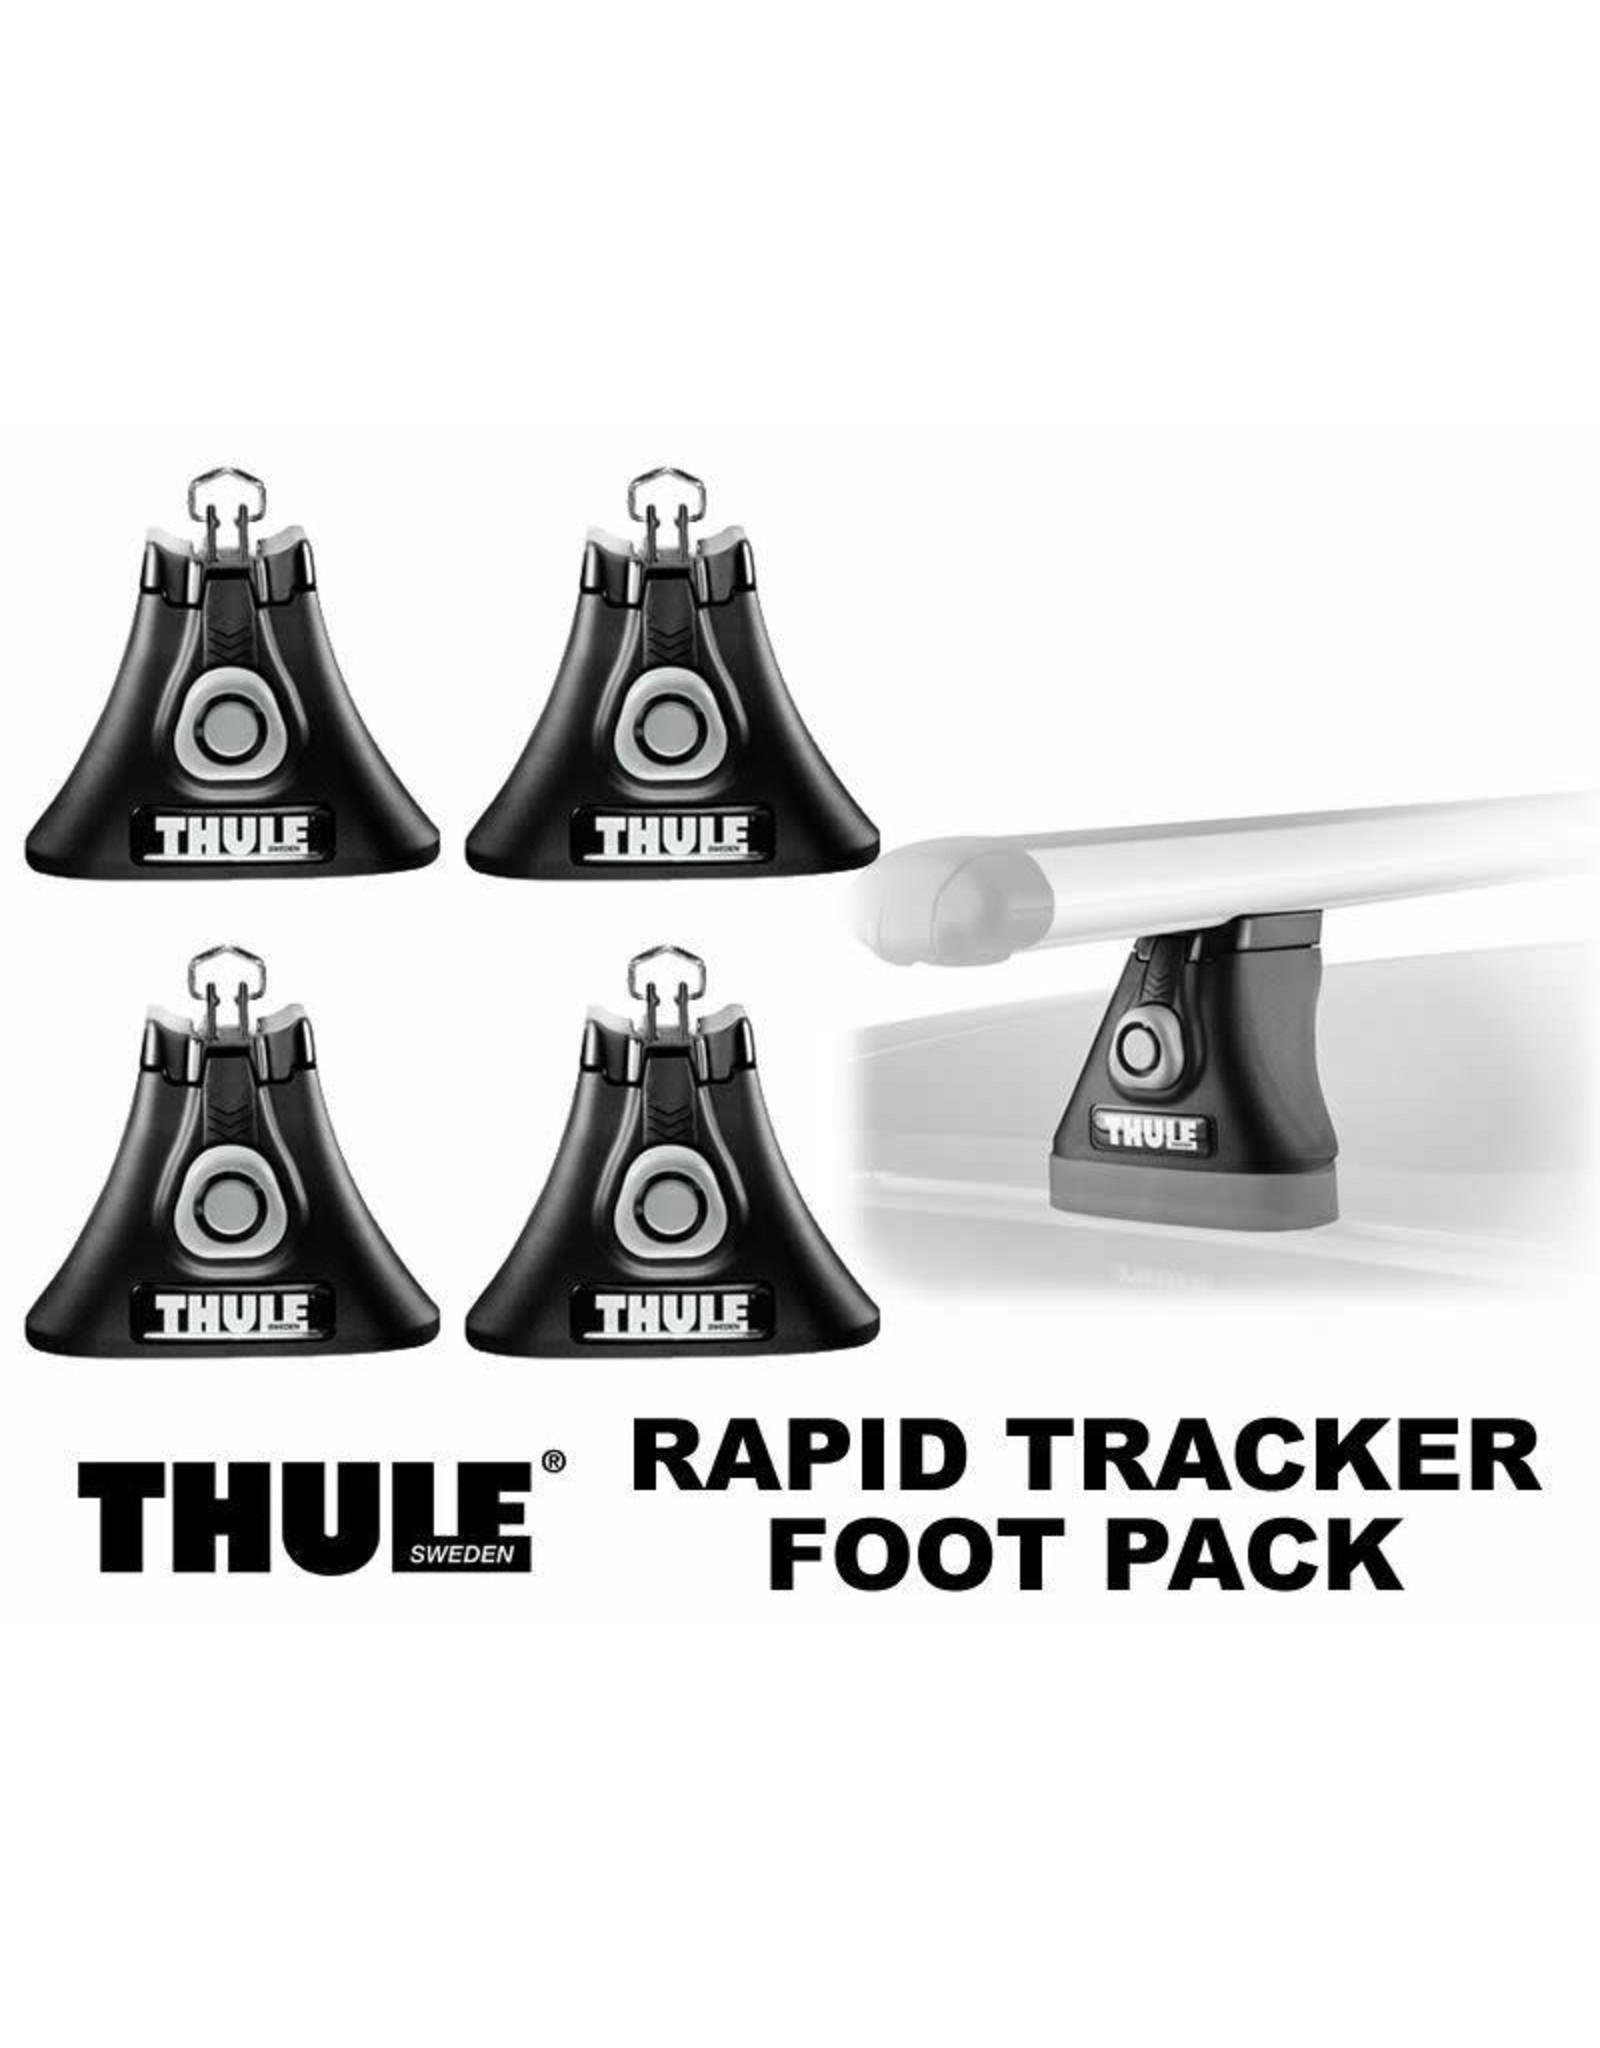 Thule Thule 430 Tracker II Foot Pack Load Bar Tower Set: Fits Rectangular Bar; 4-Pack